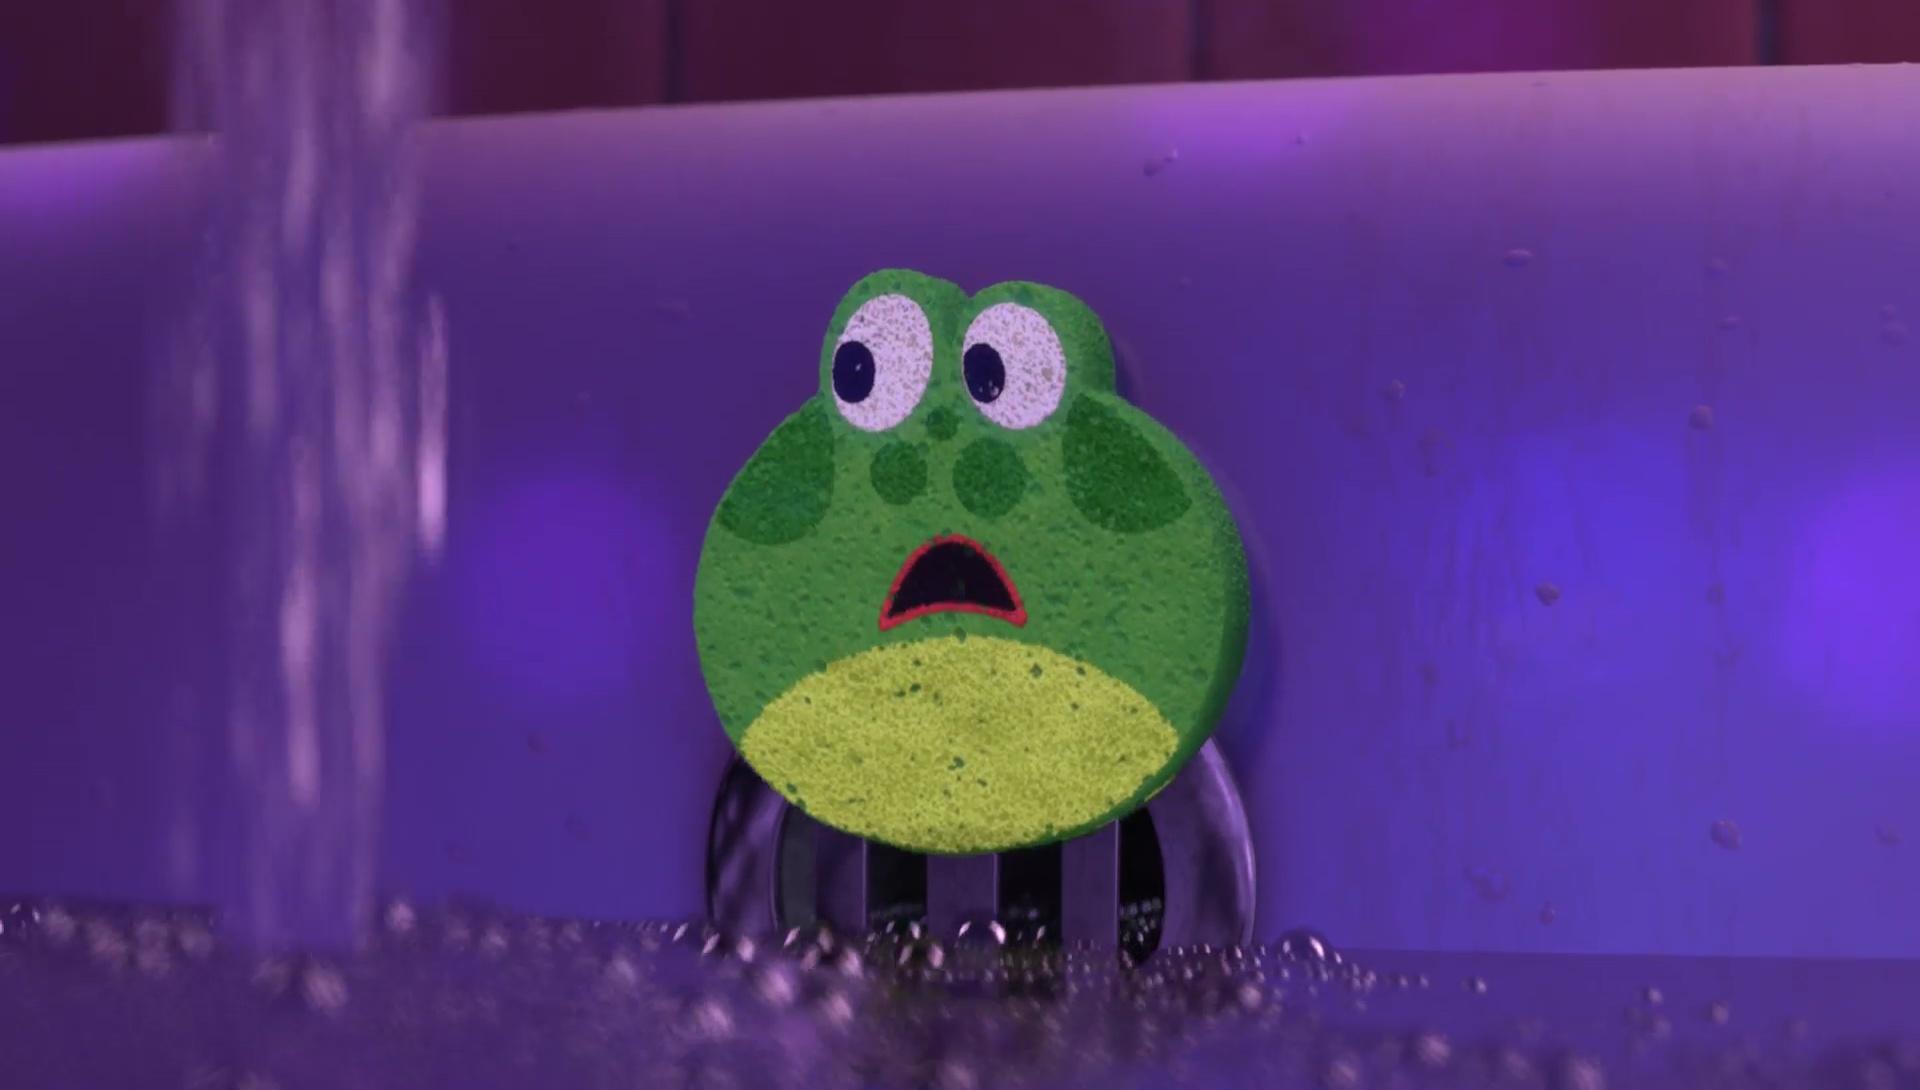 eponge sponge personnage character pixar disney toy story toons rex roi fête partysaurus